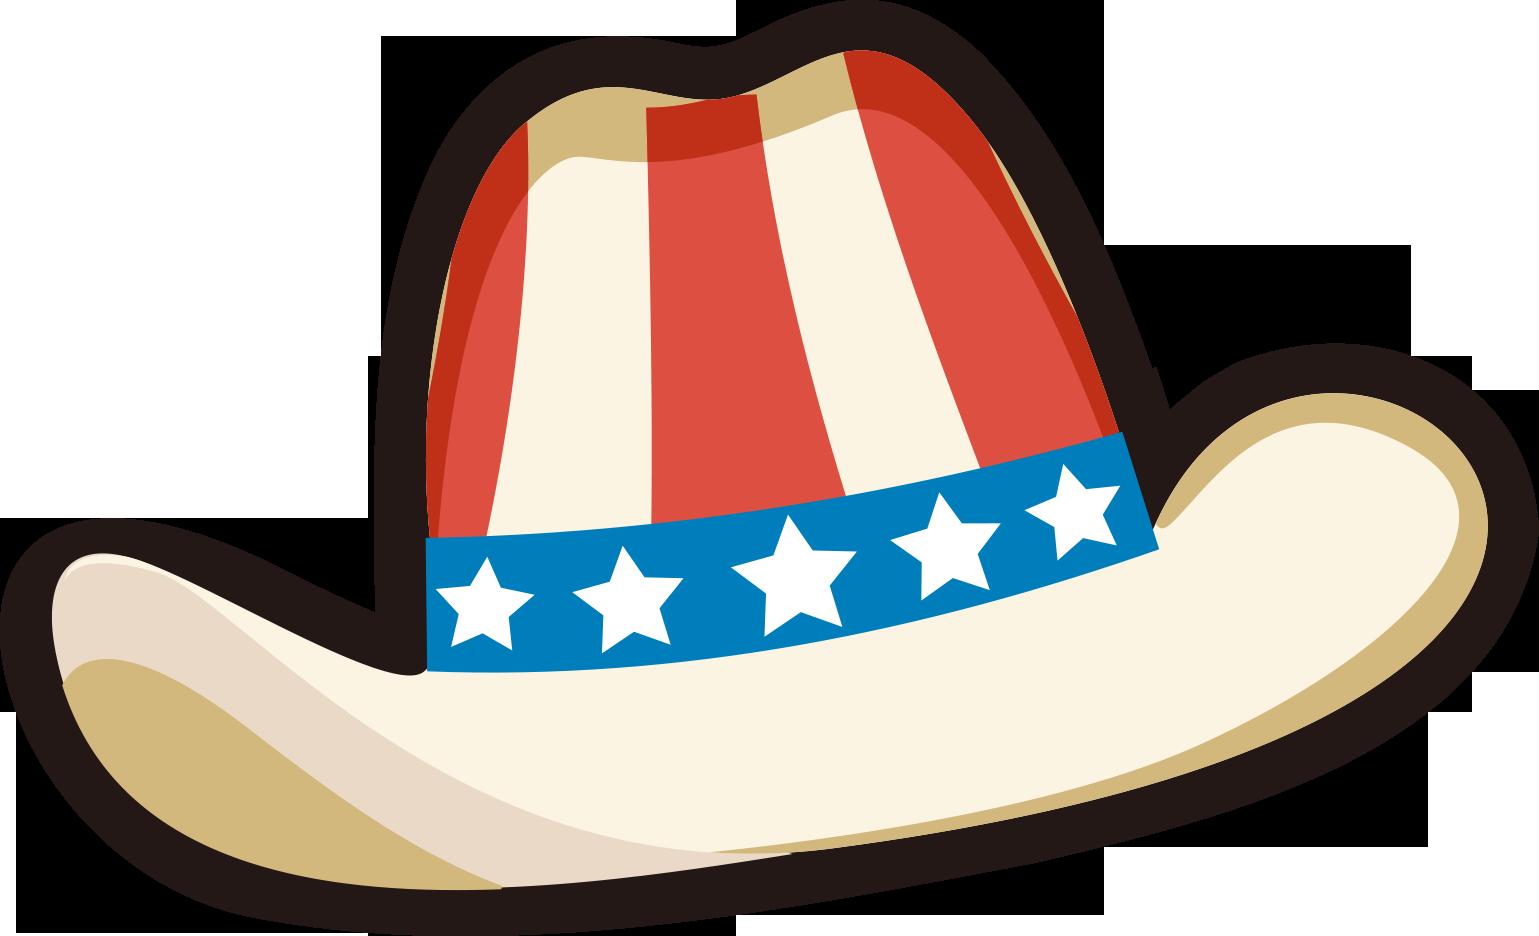 United states clipart cartoon. Cowboy hat clip art